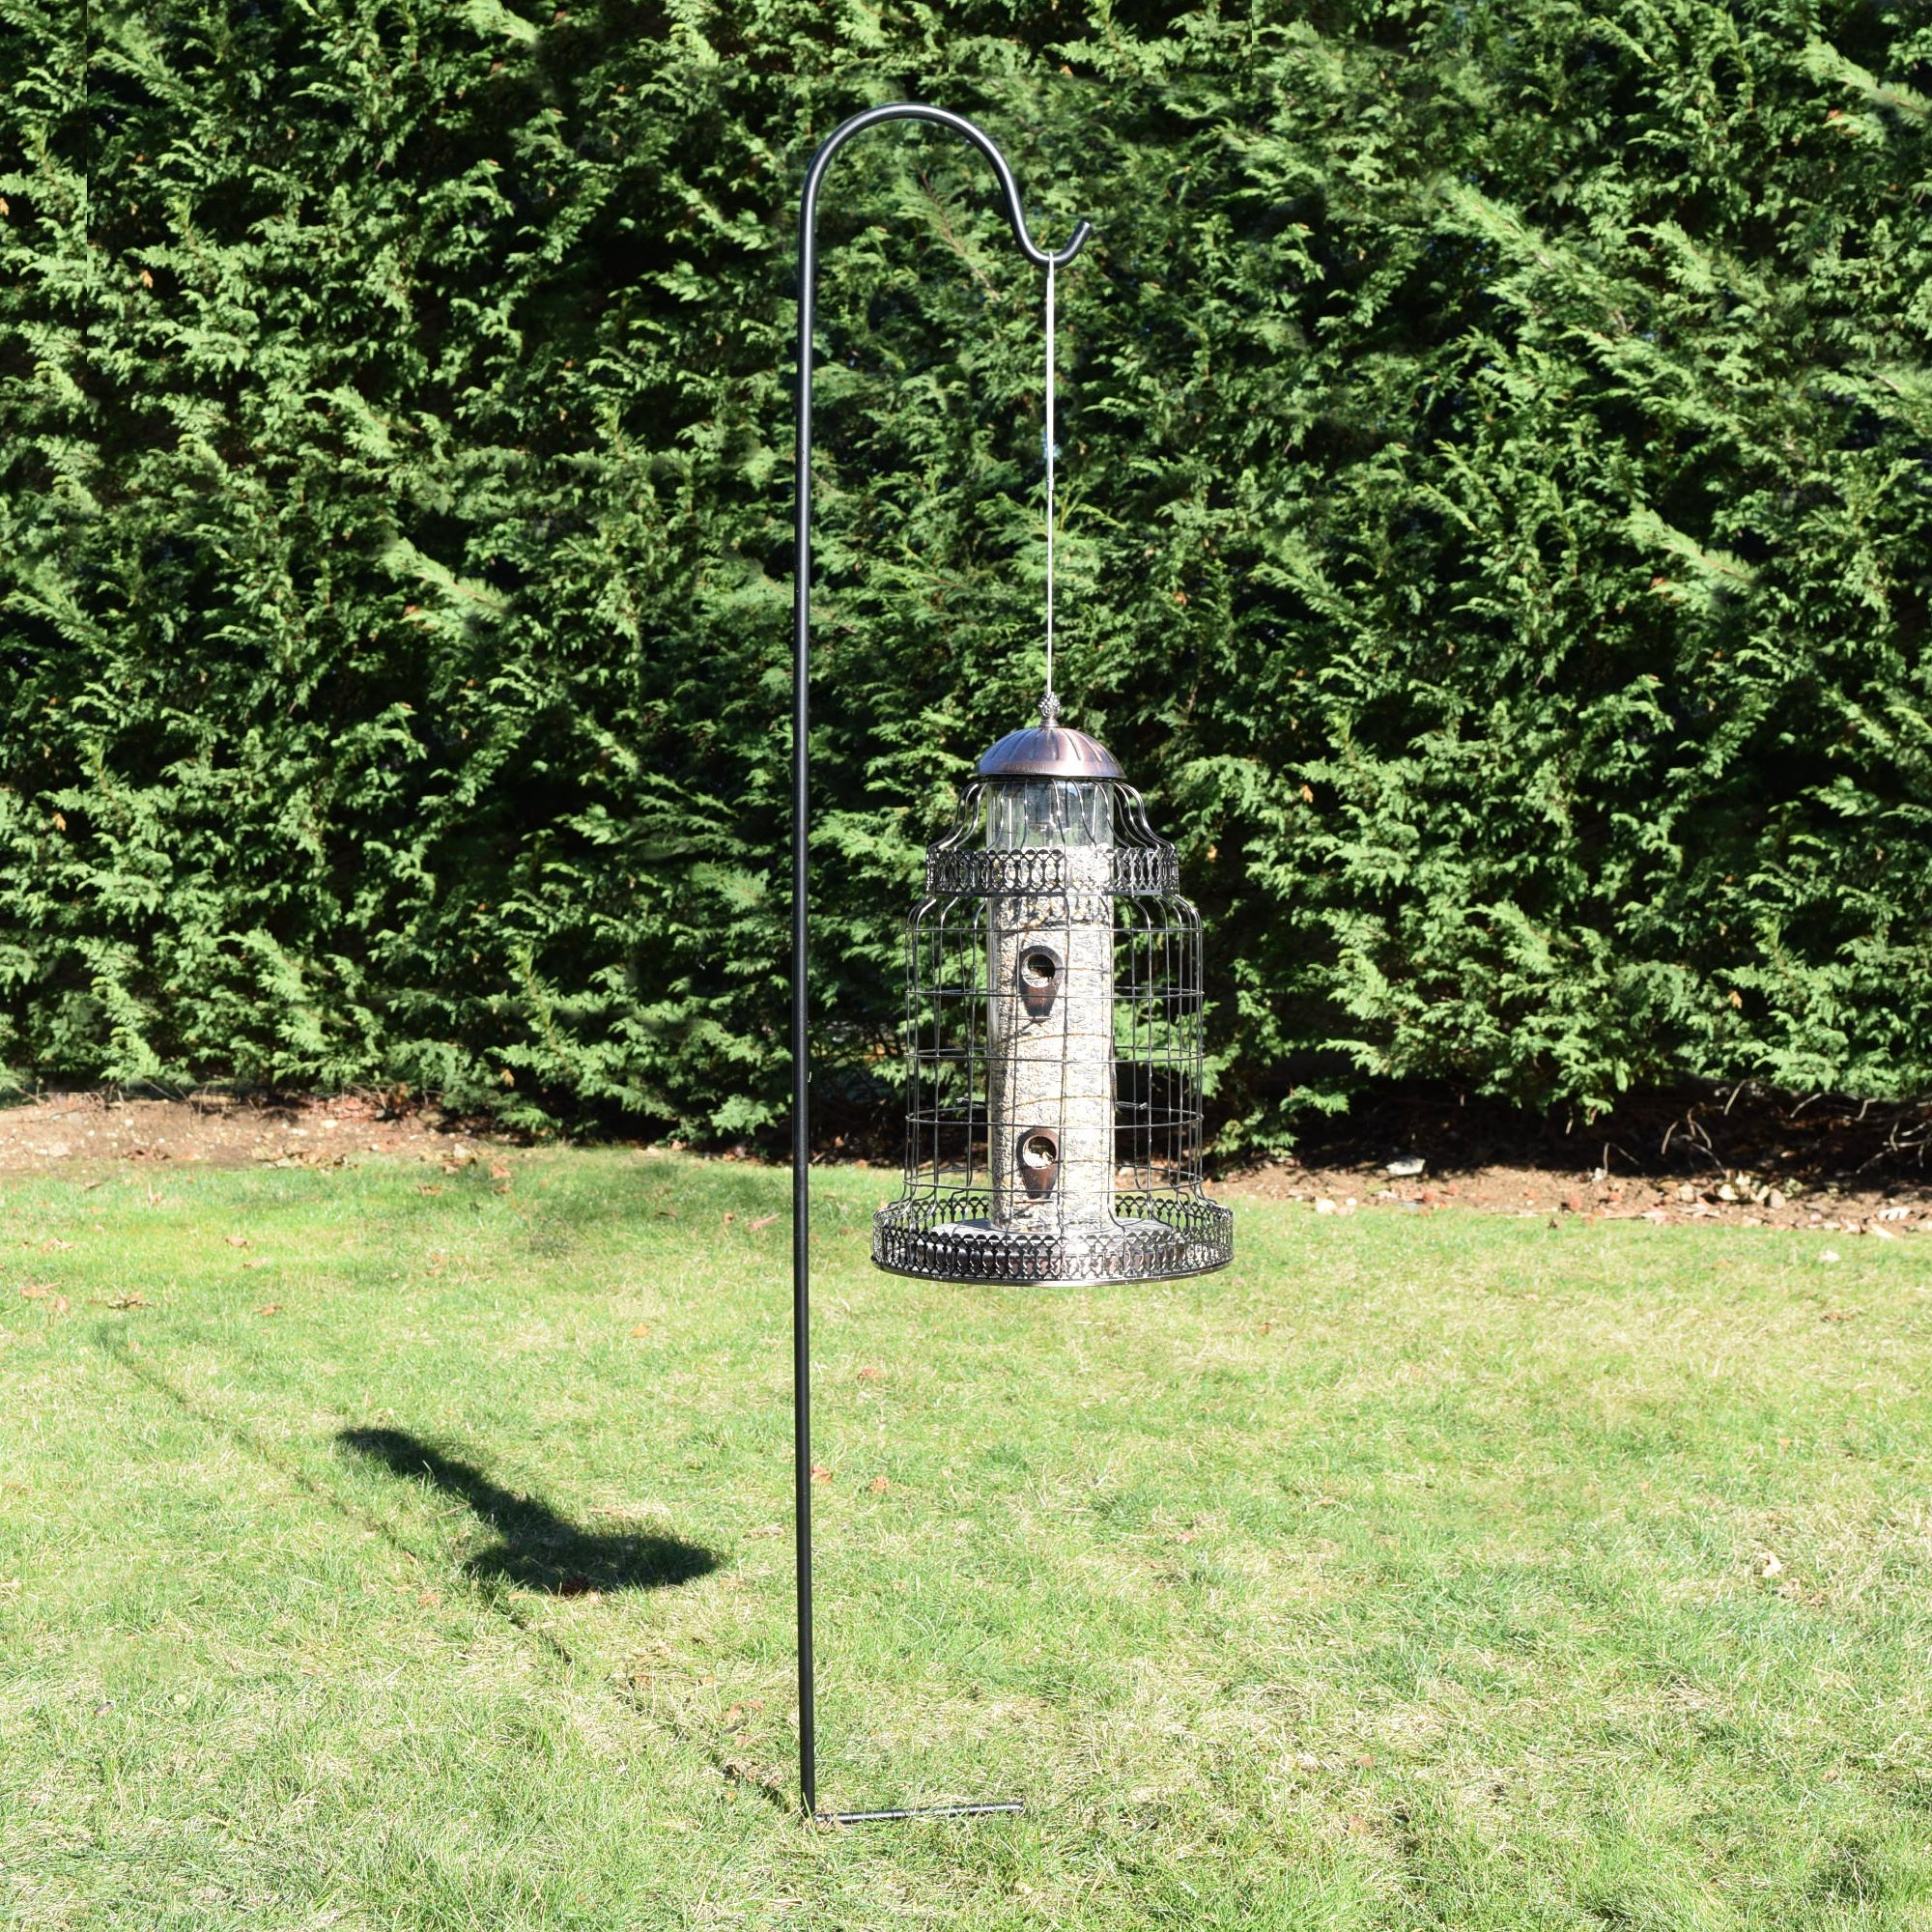 Gray Bunny Shepherd Hook, 65 inch Black 1/2 Inch Thick, Set of 4, Solid (Non-Hollow) Heavy Duty Rust Resistant Premium Metal Hook Hangers for Weddings, Plant Baskets Solar Lights Lantern Bird Feeders